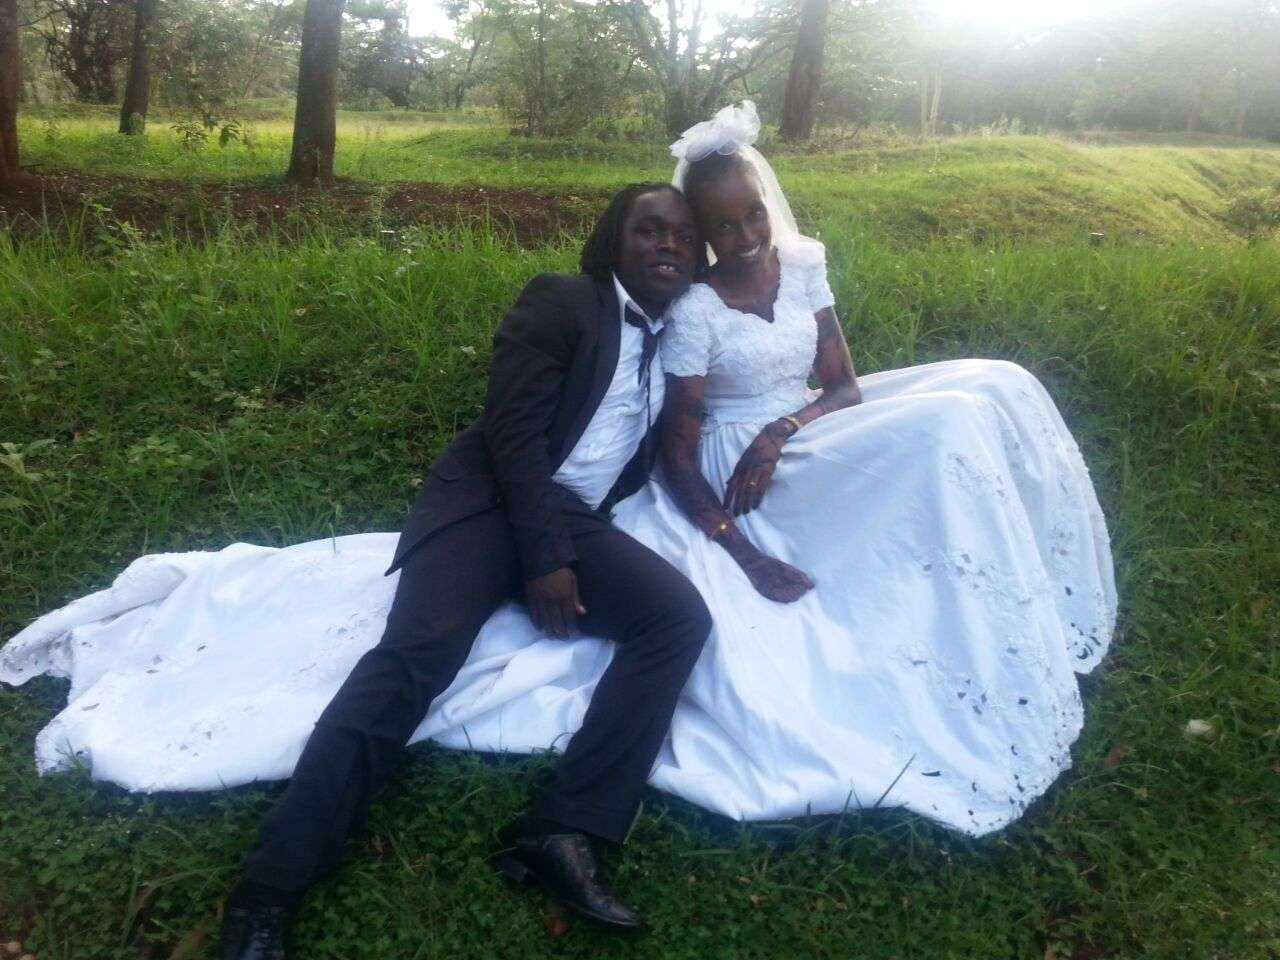 Uganda and Simba SC striker Dan Sserunkuma returned to Kenya on Saturday to wed Tumme Golicha Galgallo